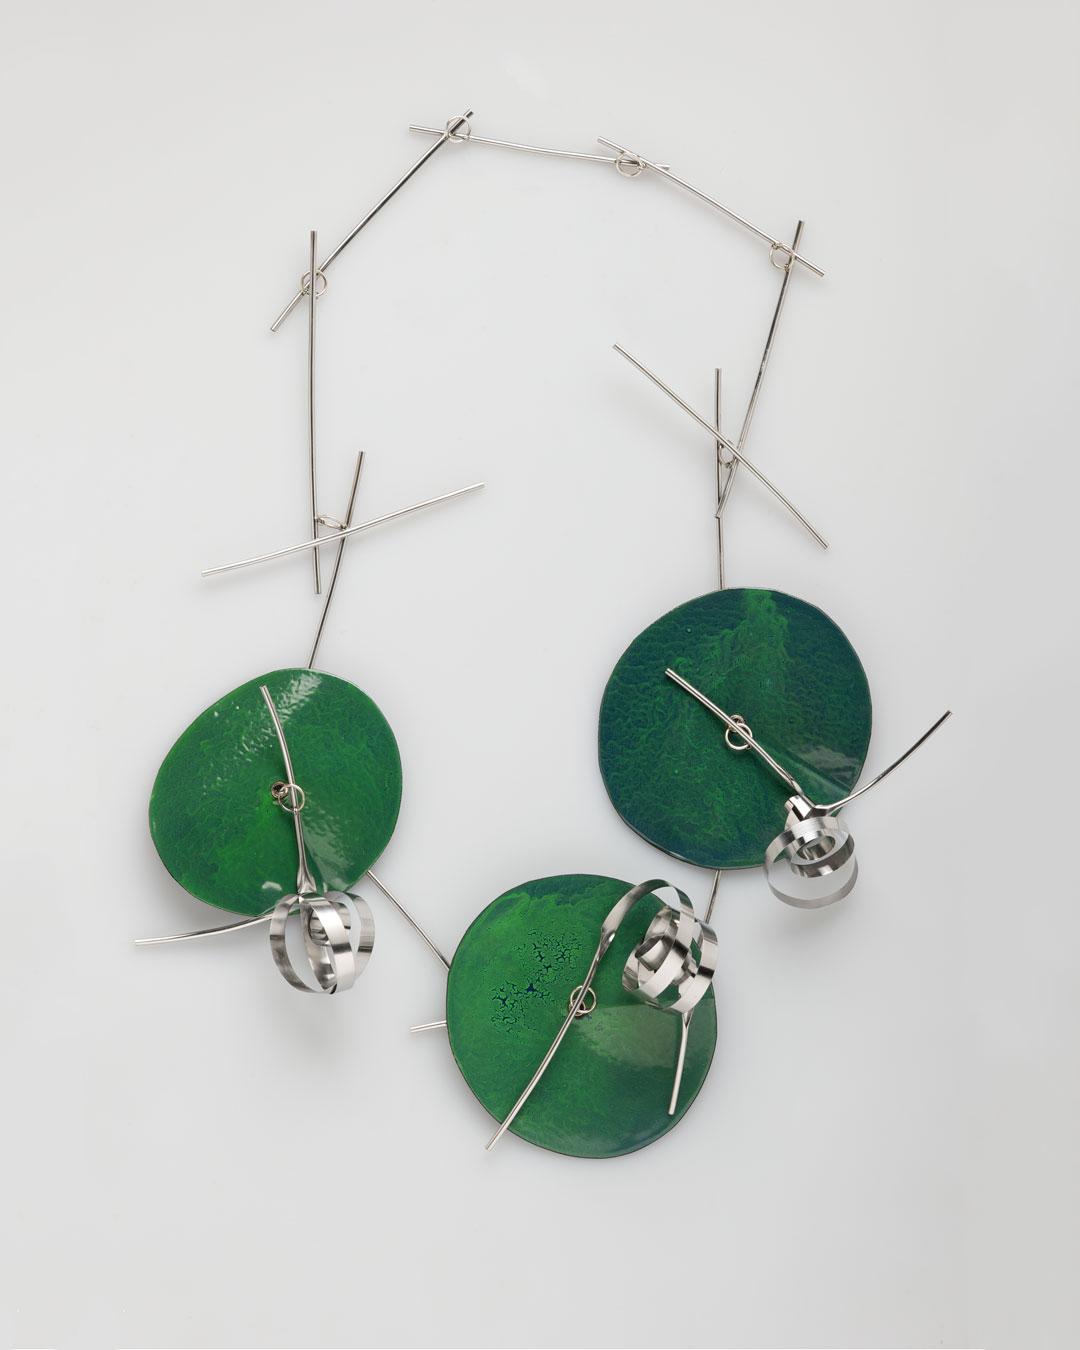 Andrea Wippermann, Japanischer Garten II (Japanese Garden II), 2011, necklace; gold, high-grade steel, enamelled steel, 420 x 280 x 70 mm, €3200